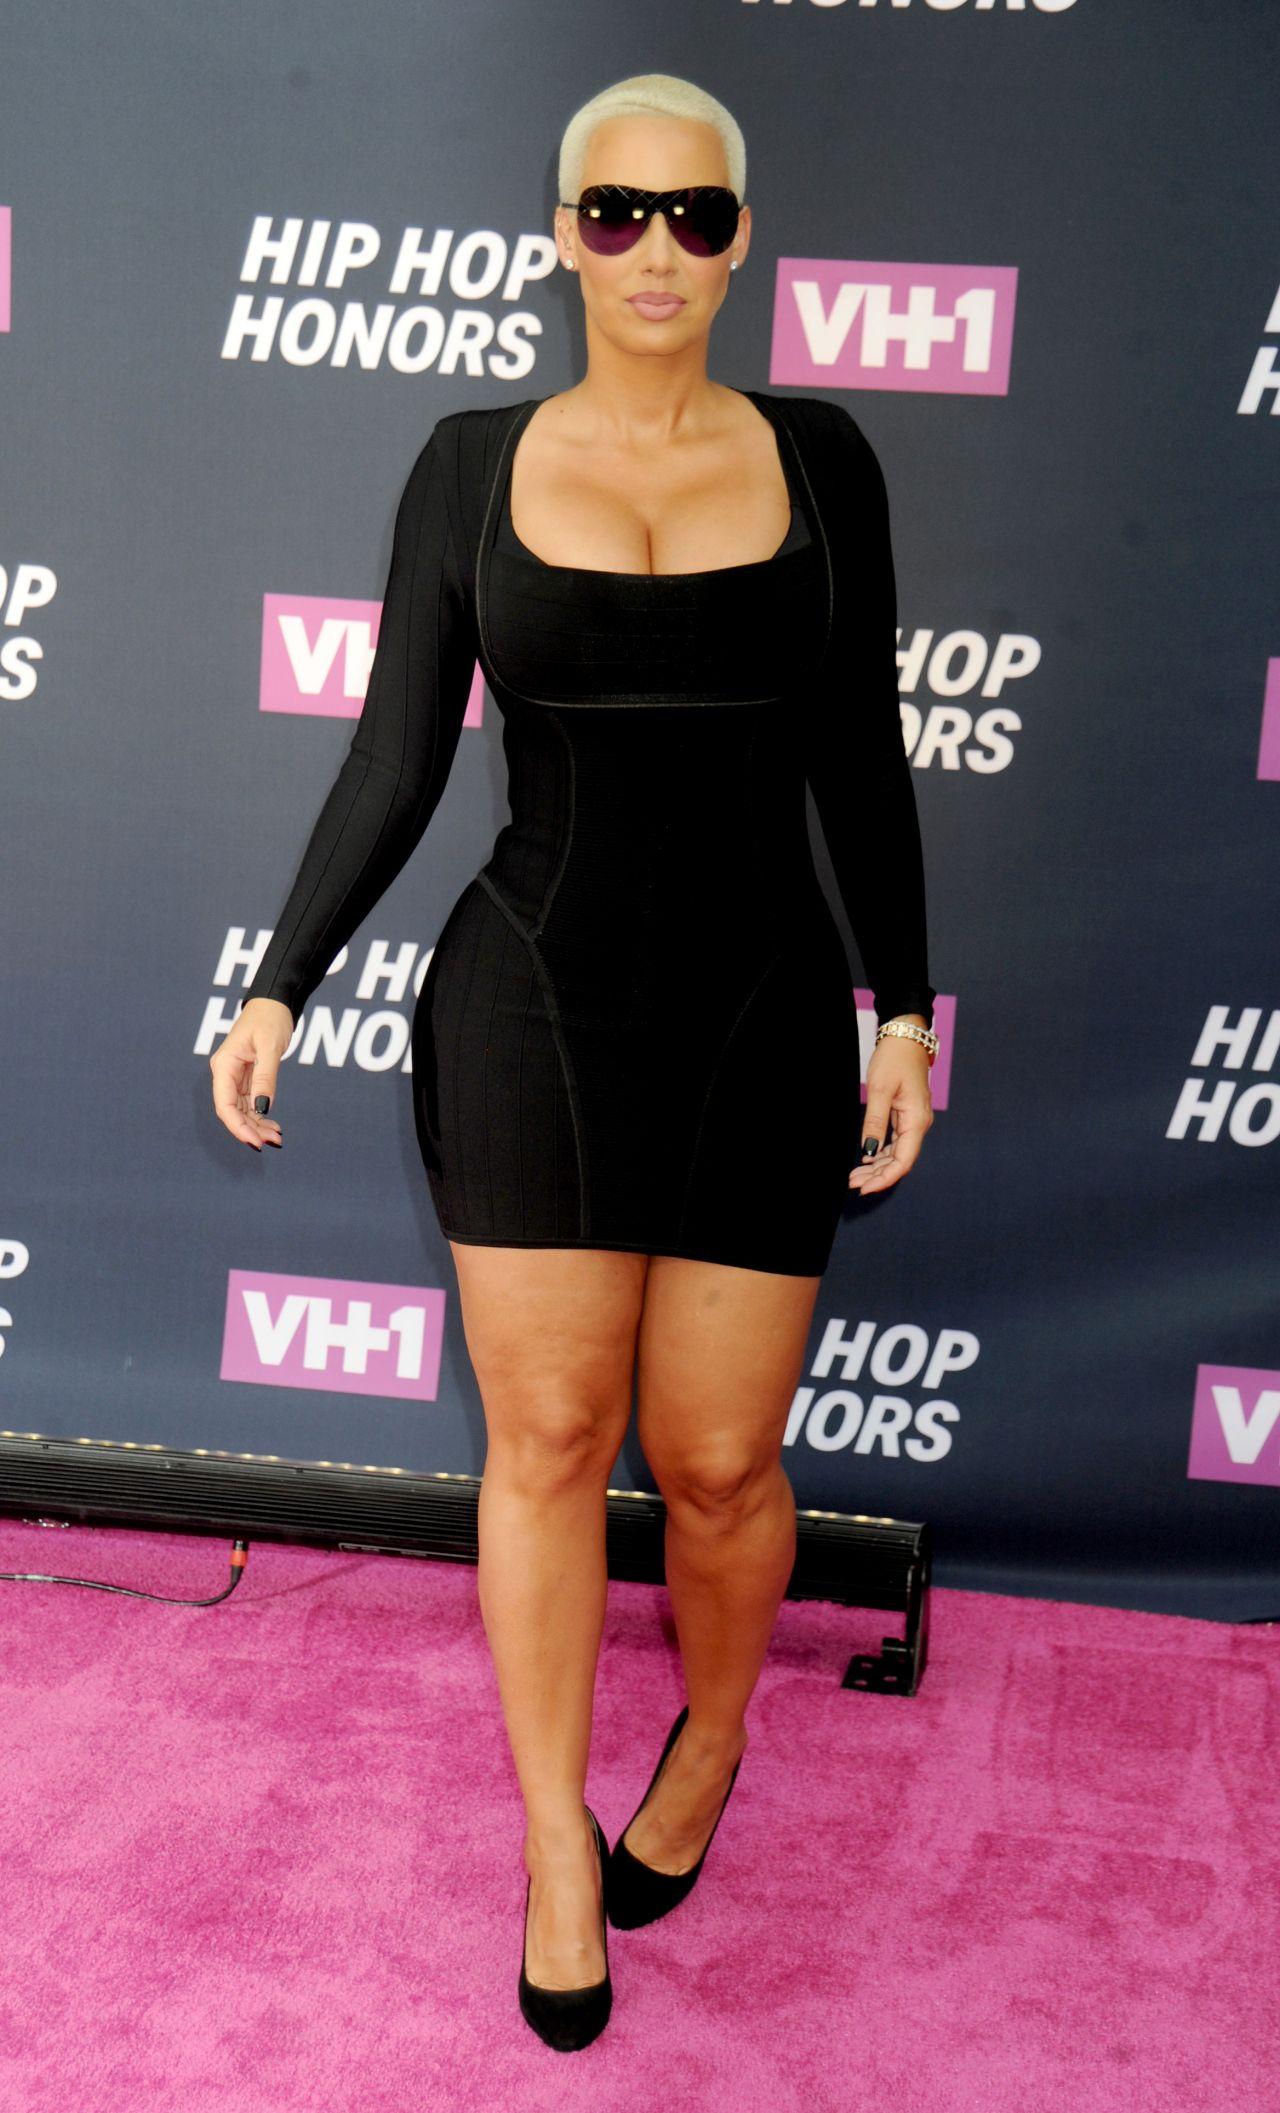 Vh1 celebrity new york